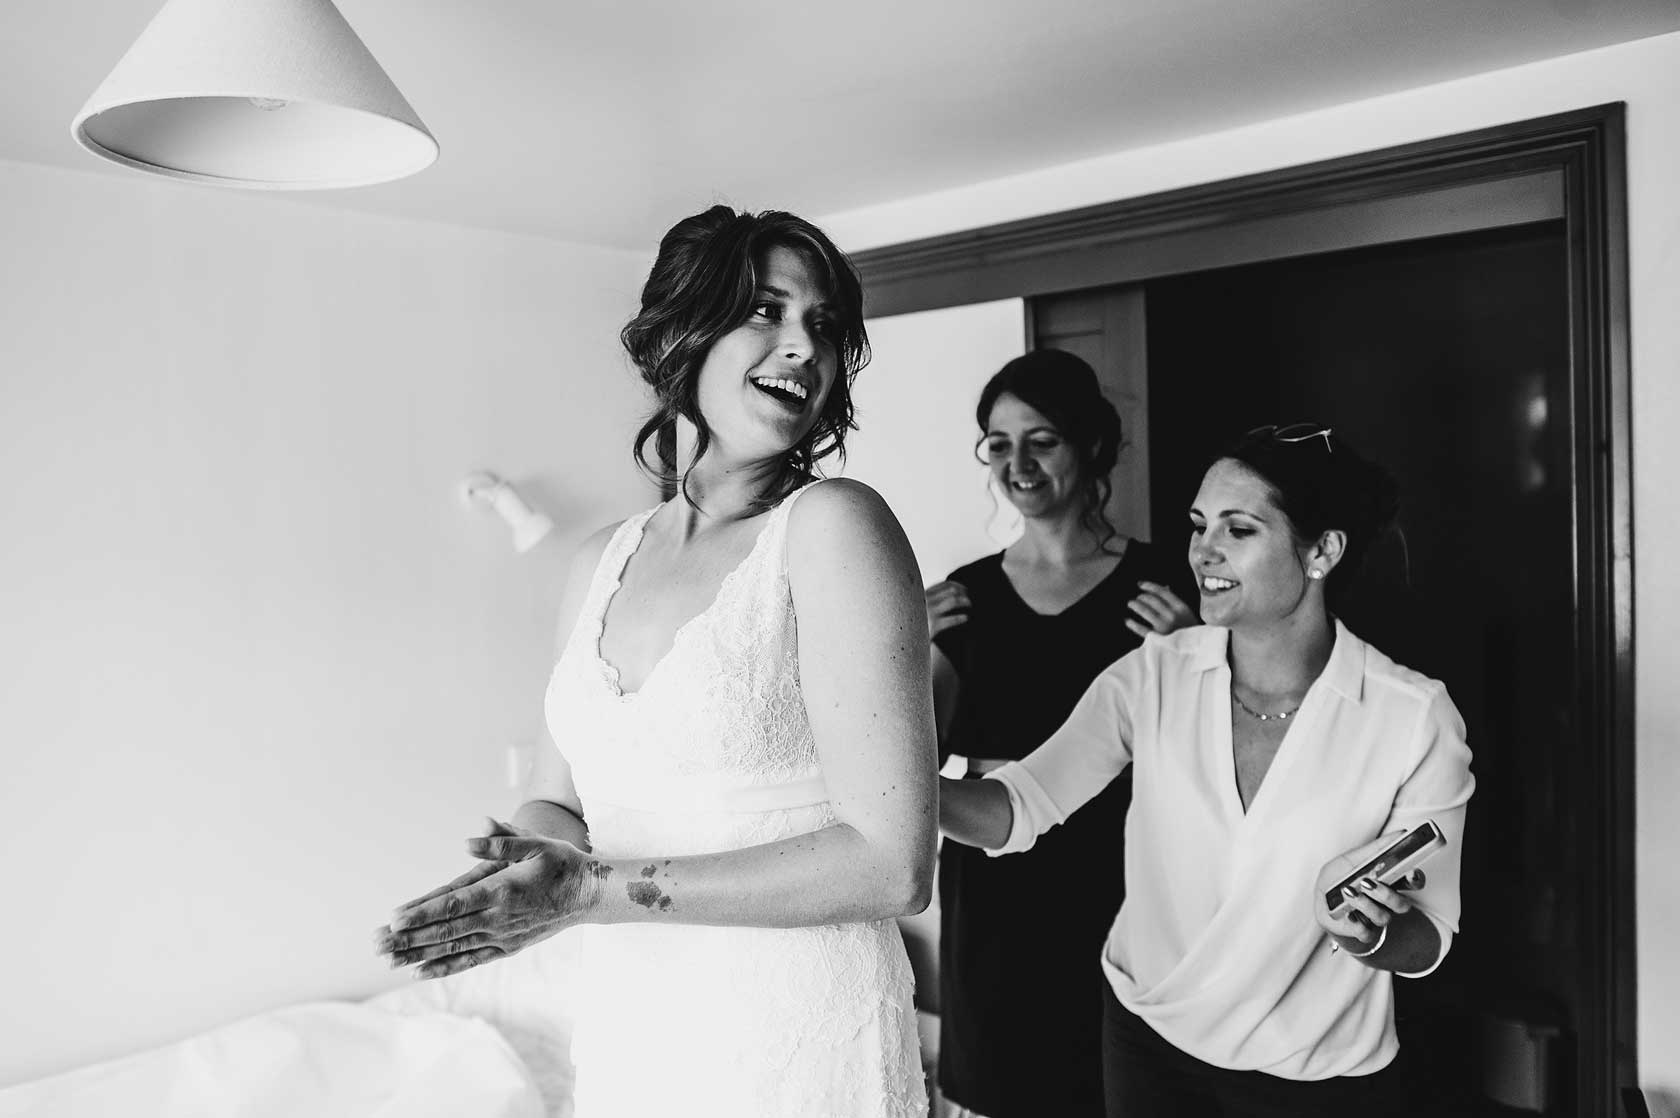 Wedding Photographer in Wiltshire